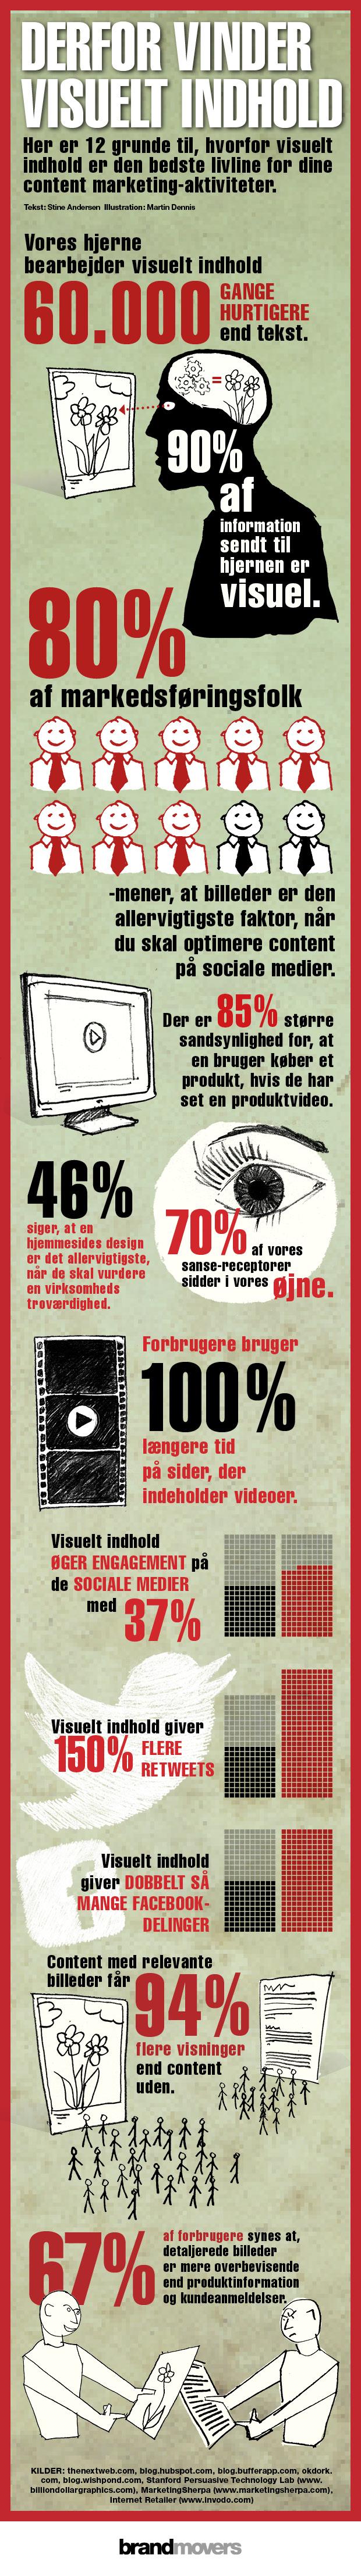 BM-CMM-Infograffik-Web-4-12-2014indd